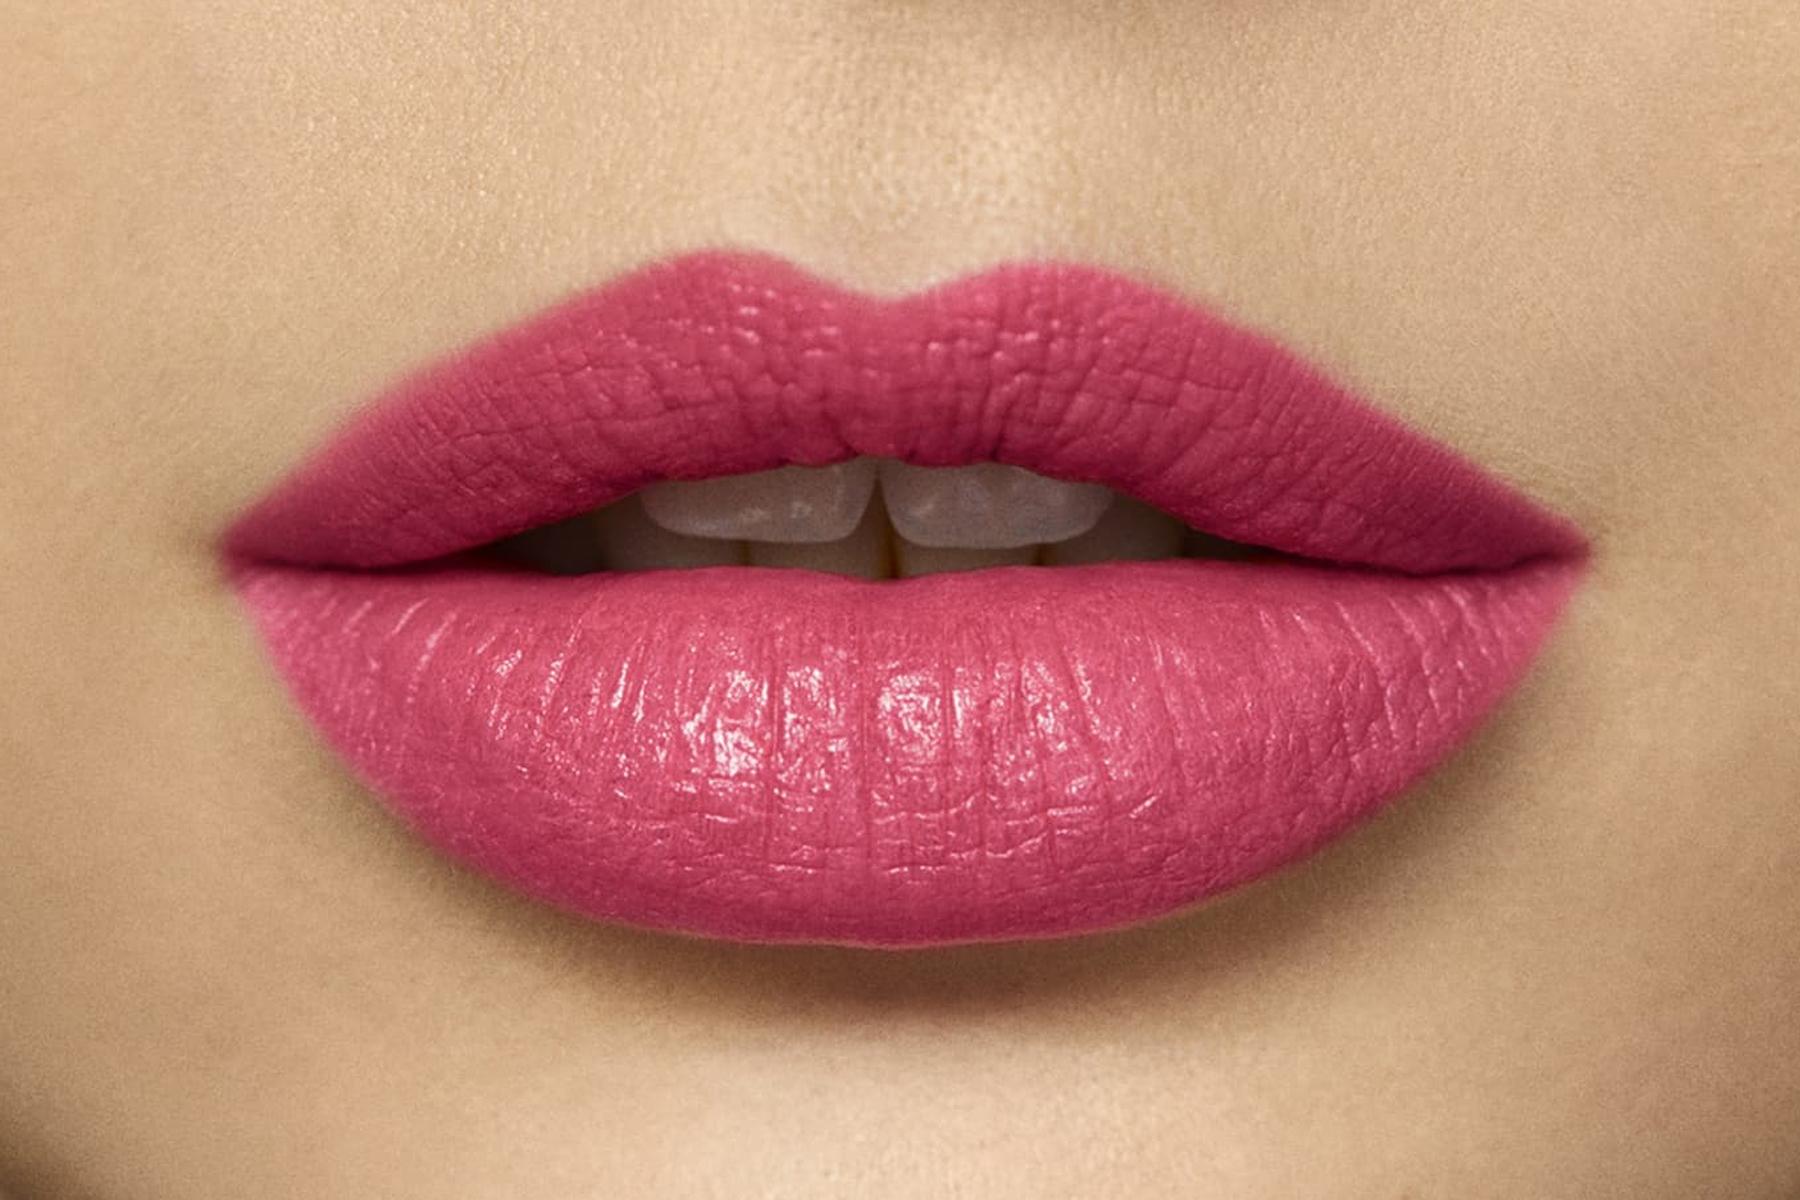 laura-mercier-rouge-essentiel-rose-ultimate-swatch